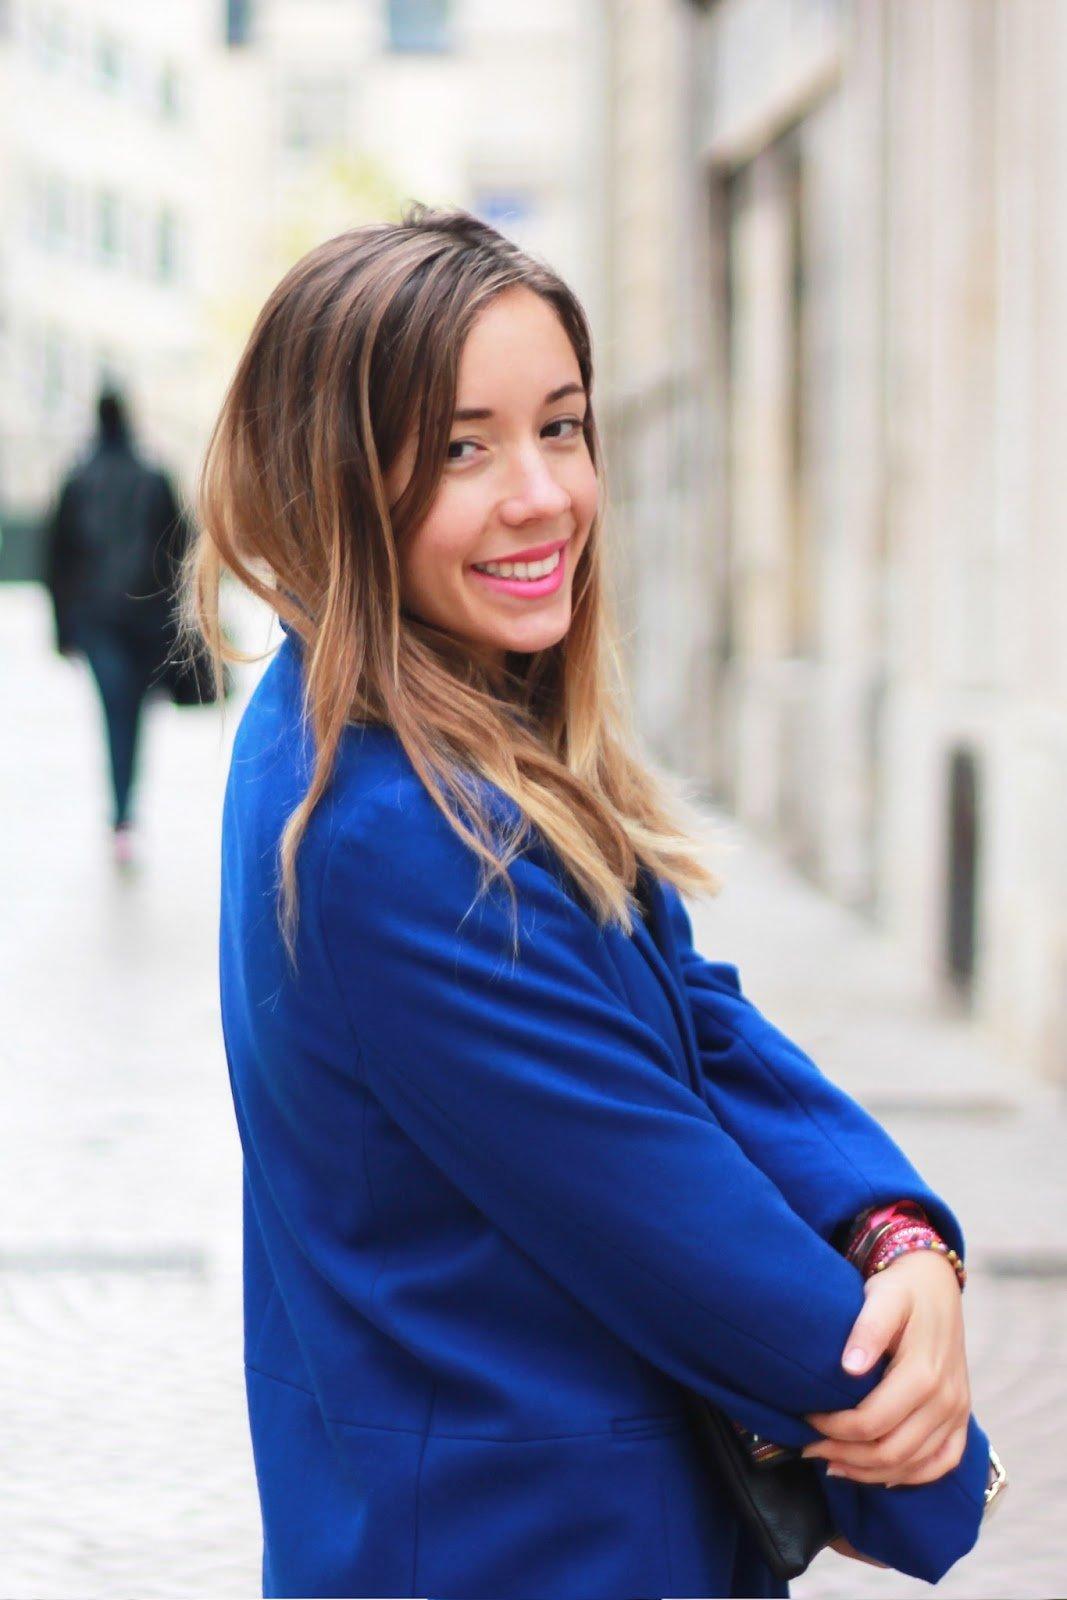 Manteau bleu foncé blog mode